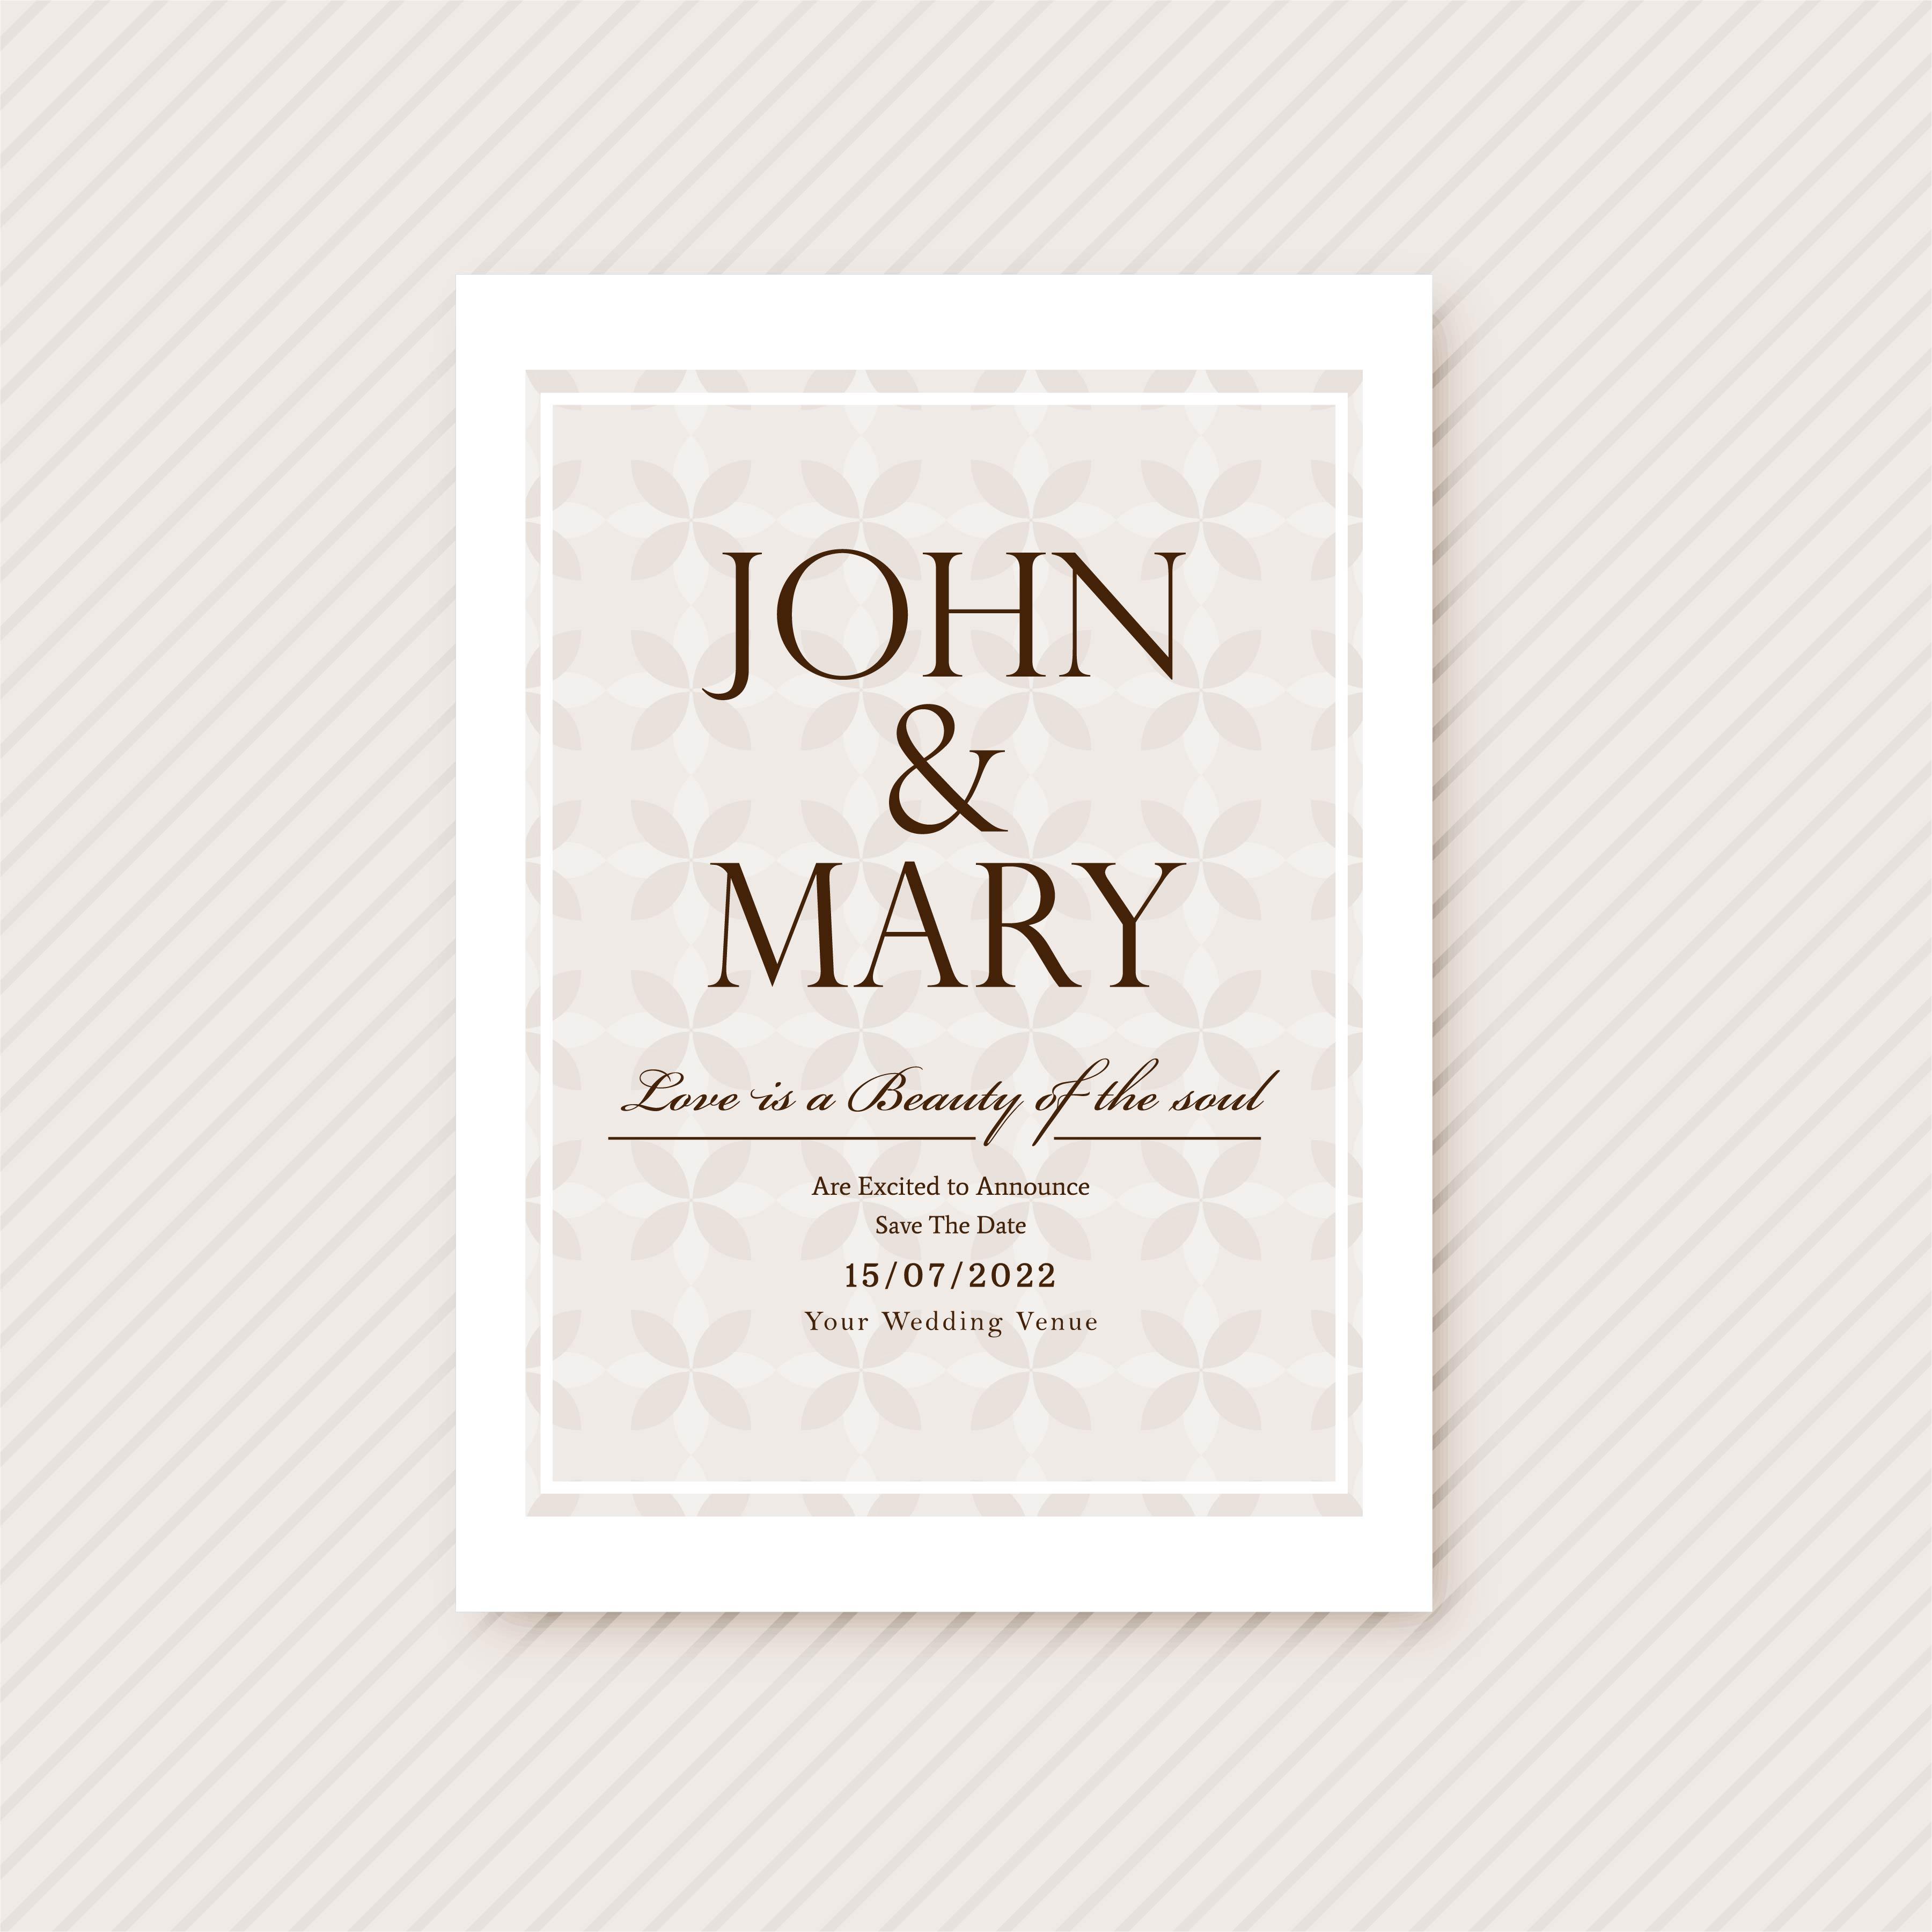 abstract wedding invitation card